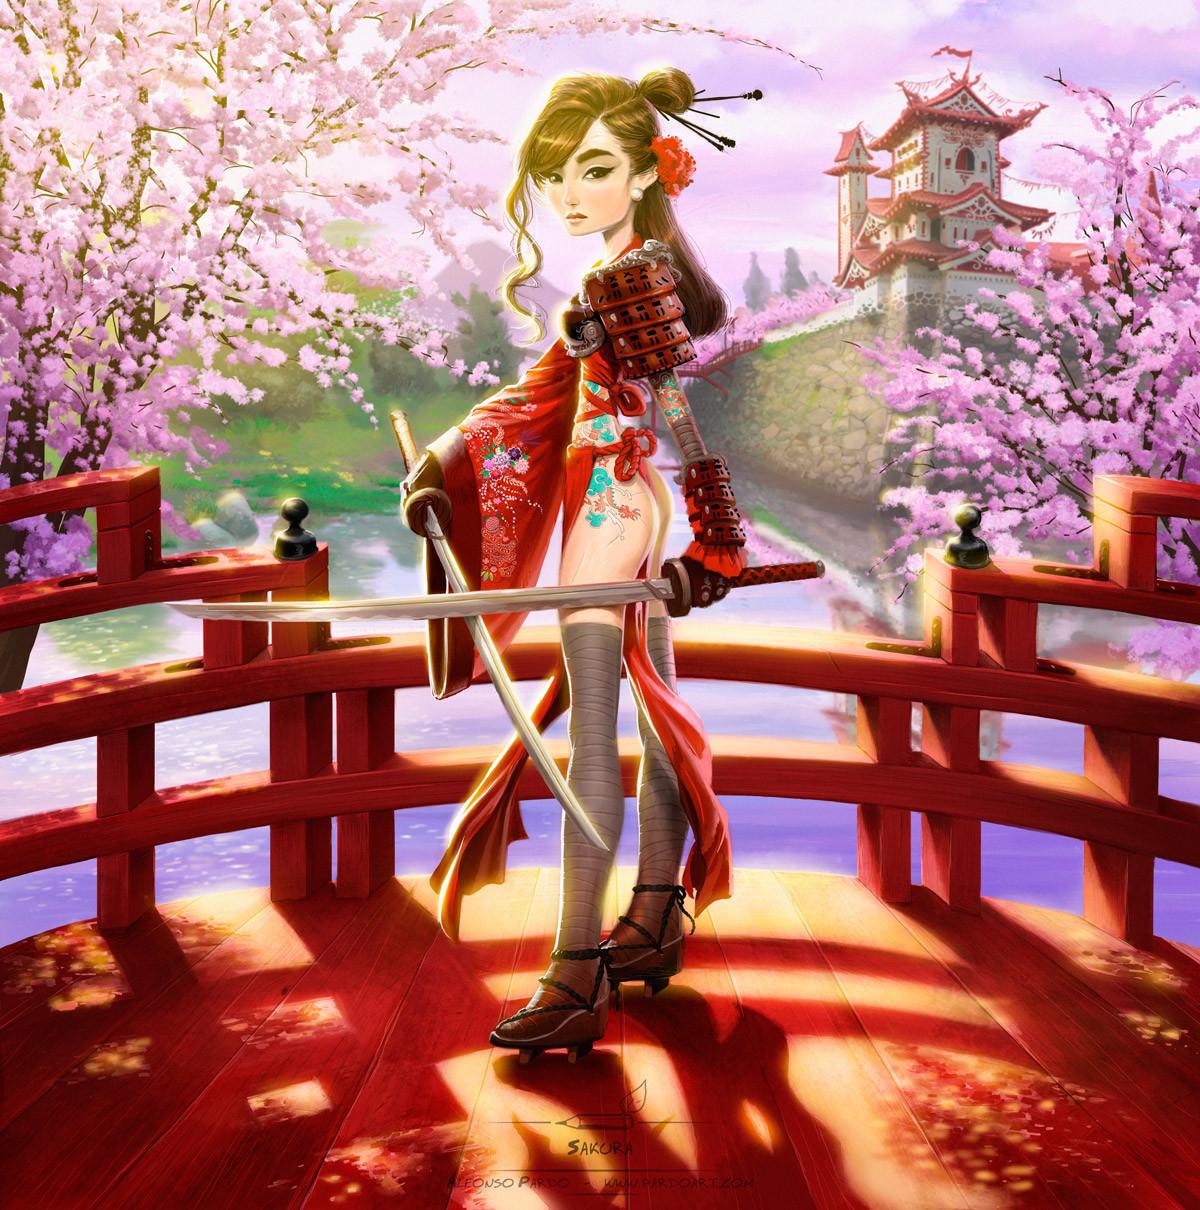 Alfonso pardo martinez samurai girl sakura pardoart